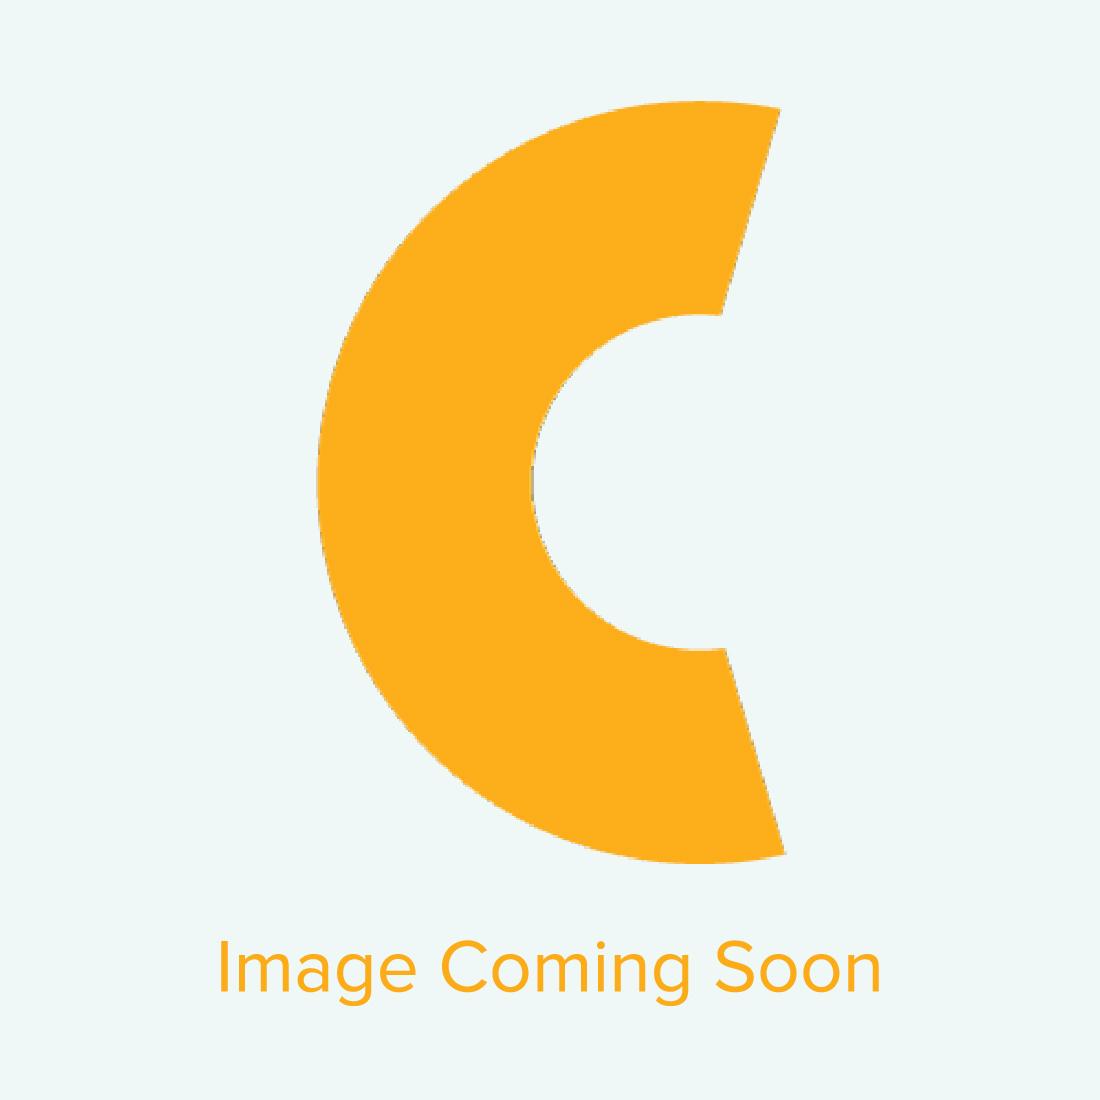 "Hotronix Craft 9"" x 12"" Clamshell Heat Press"